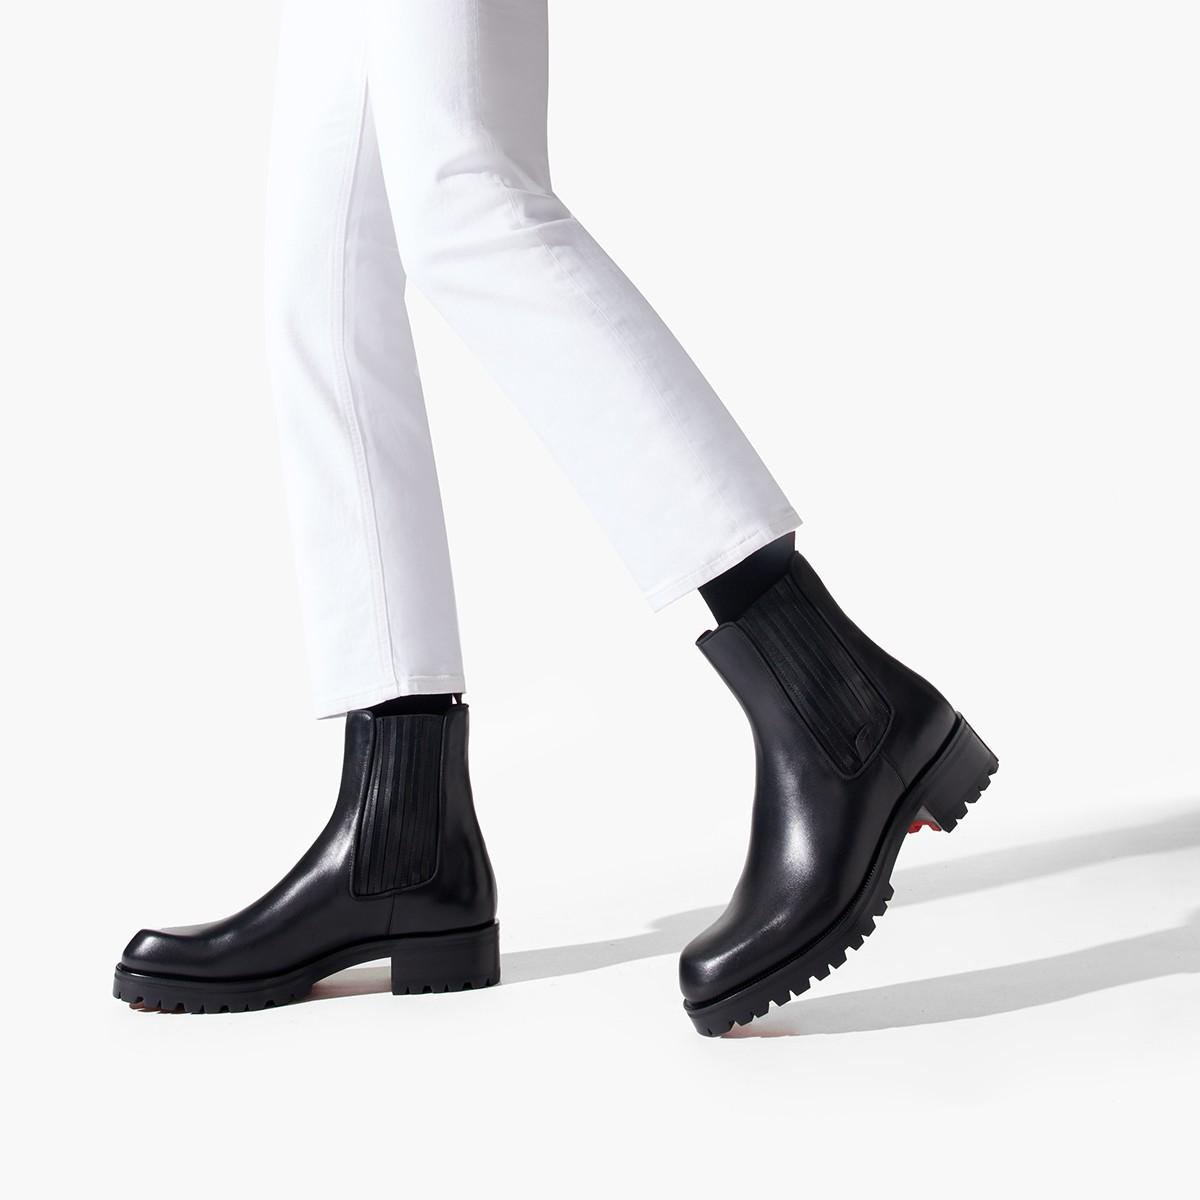 鞋履 - Motok - Christian Louboutin